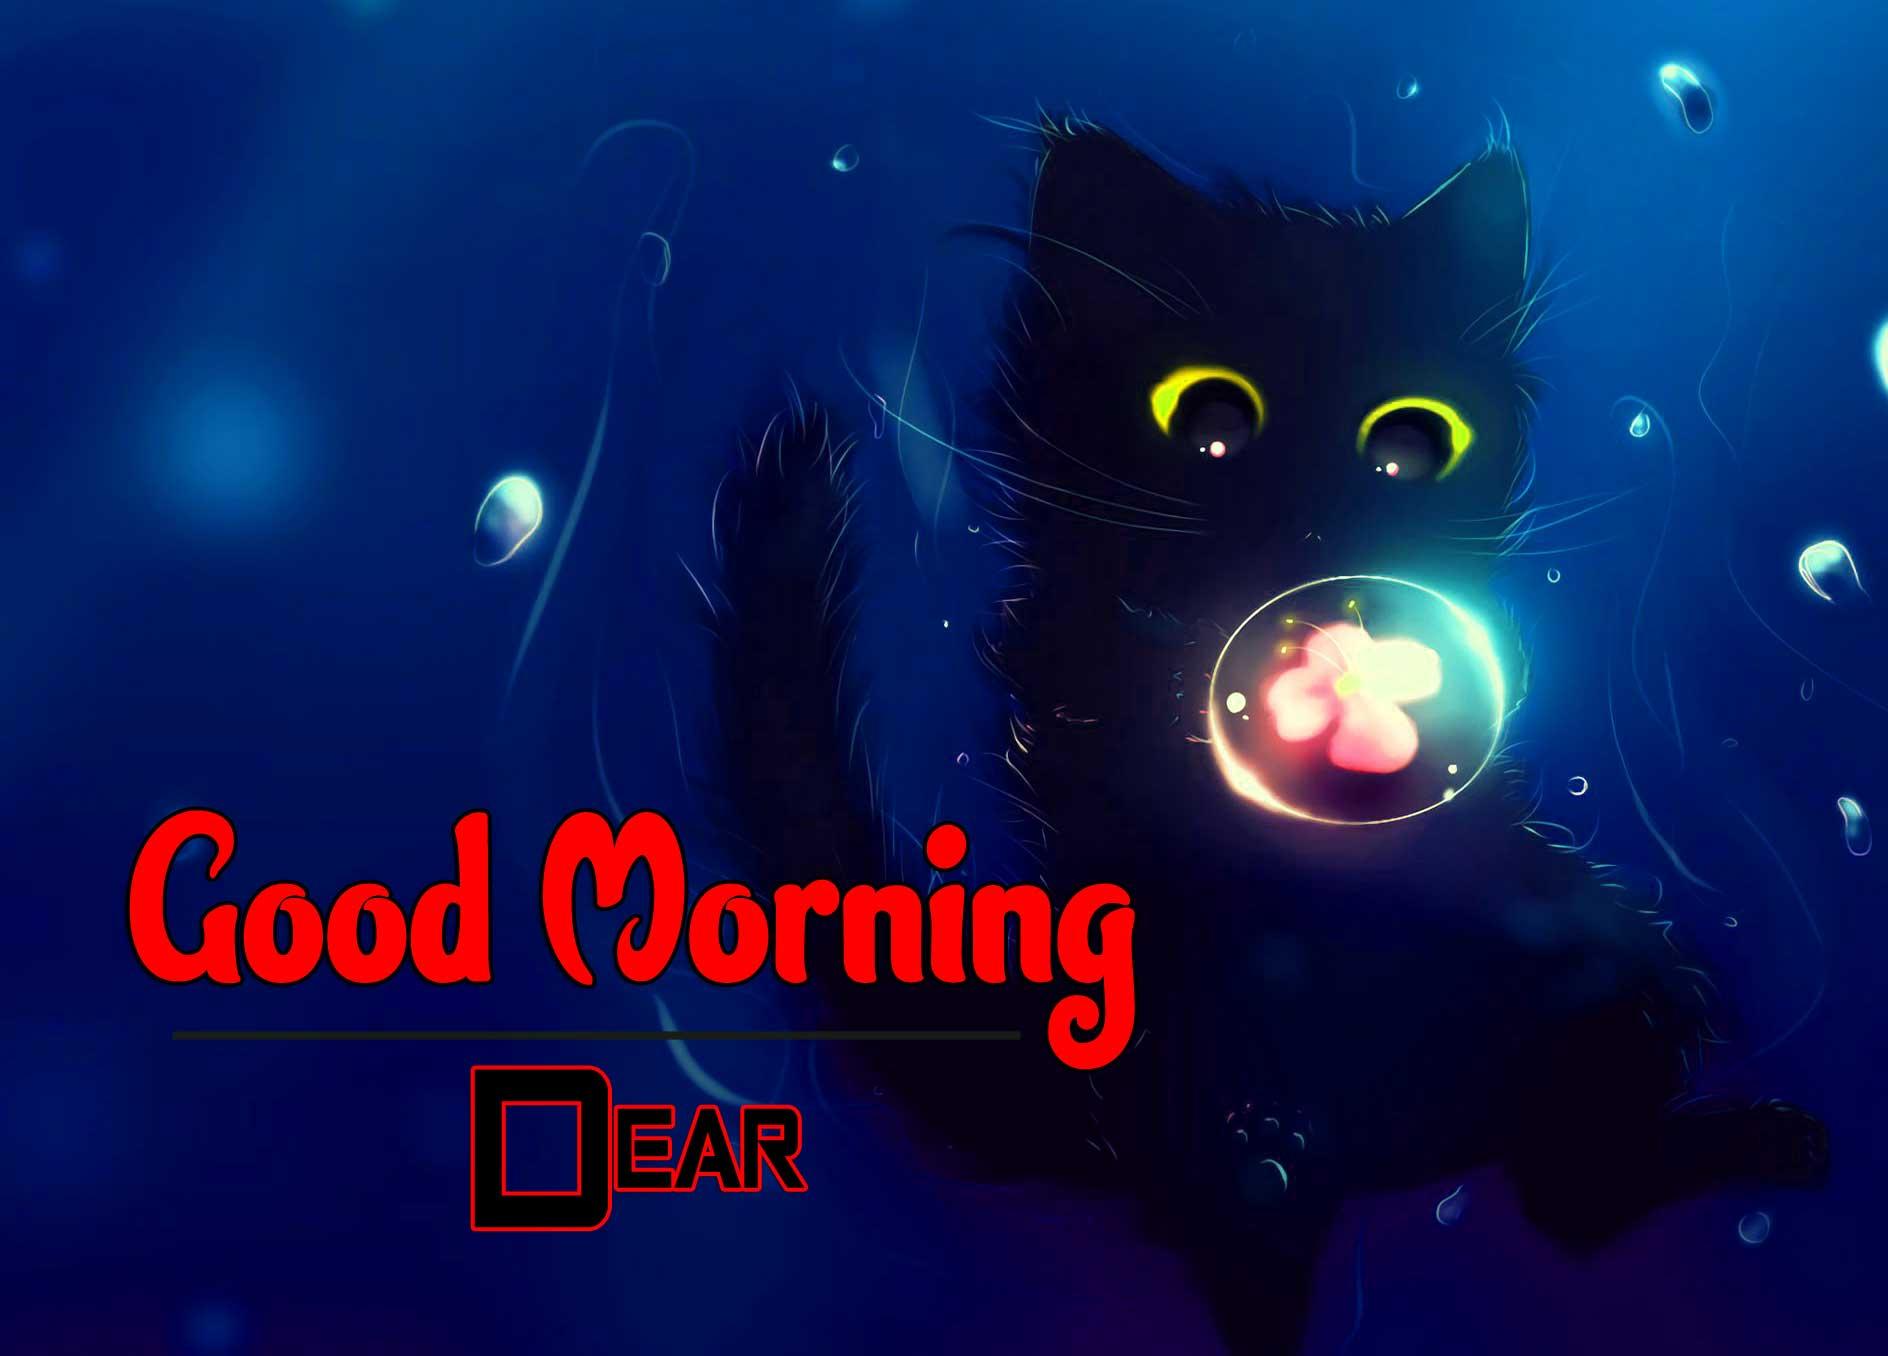 Quality Free Wonderful Good Morning 4k Pics Images Download